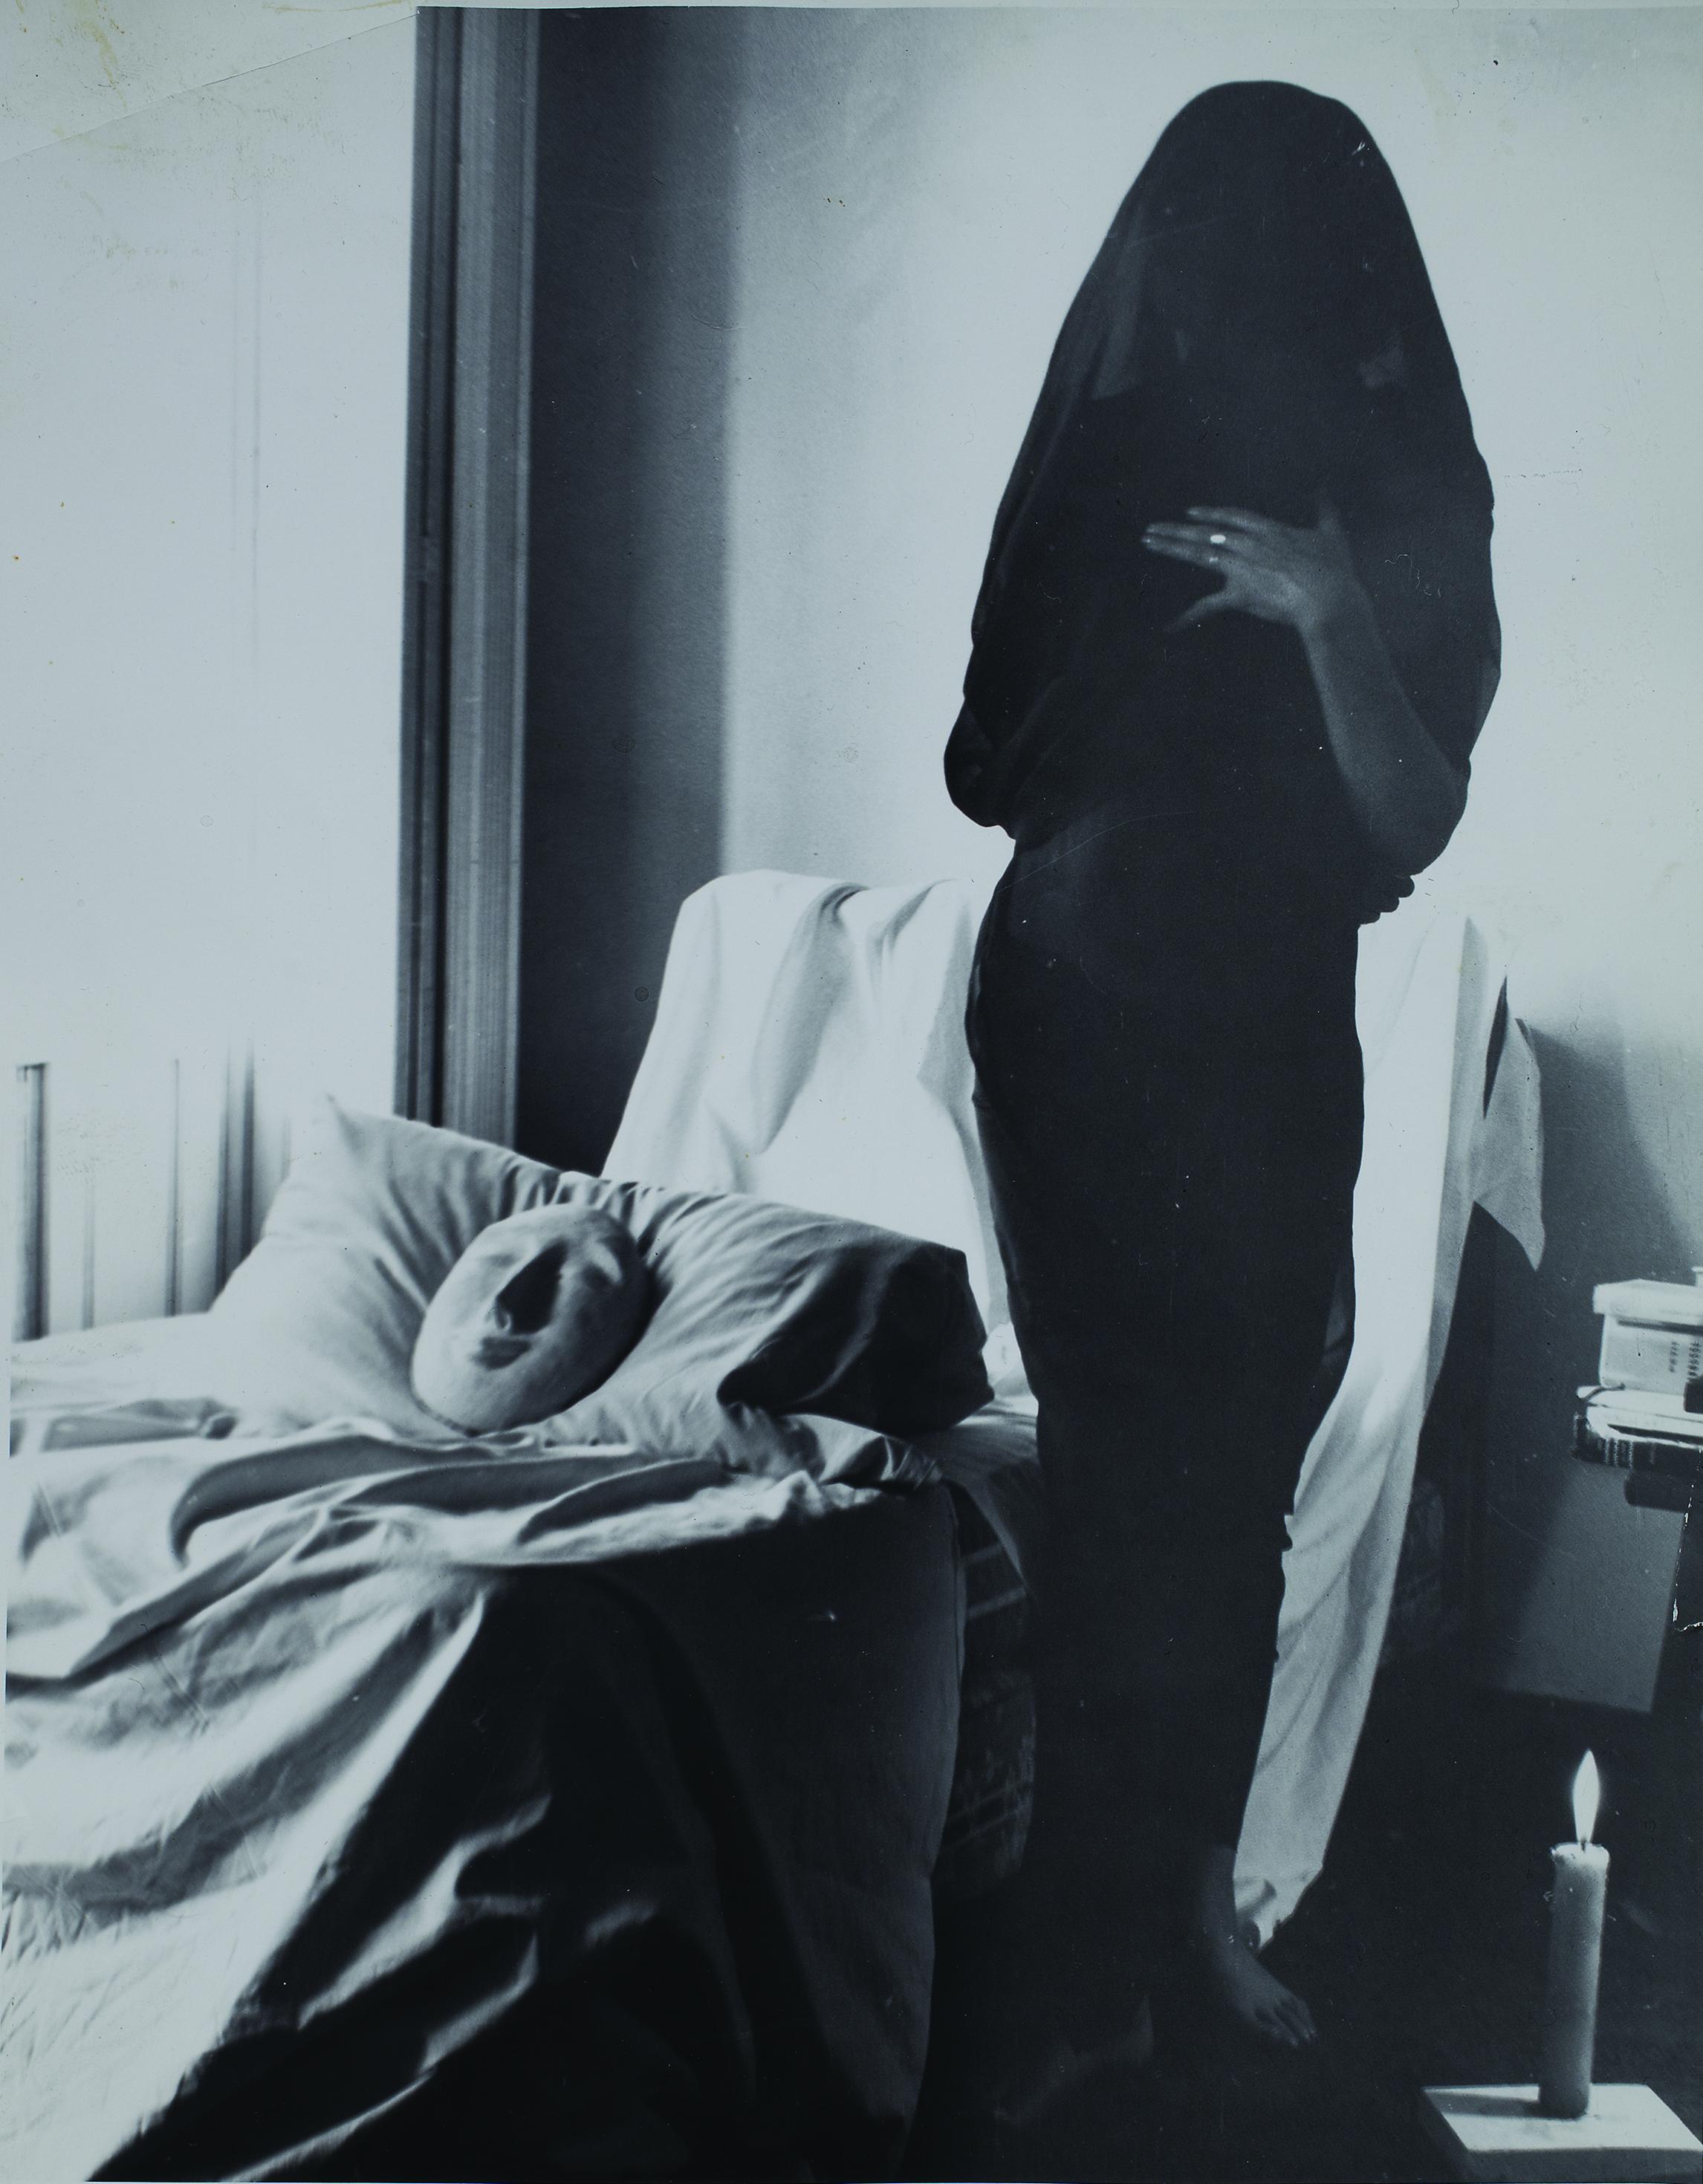 Untitled, série Oda a la necrofília [Ode to Necrophilia], Mexico, 1962